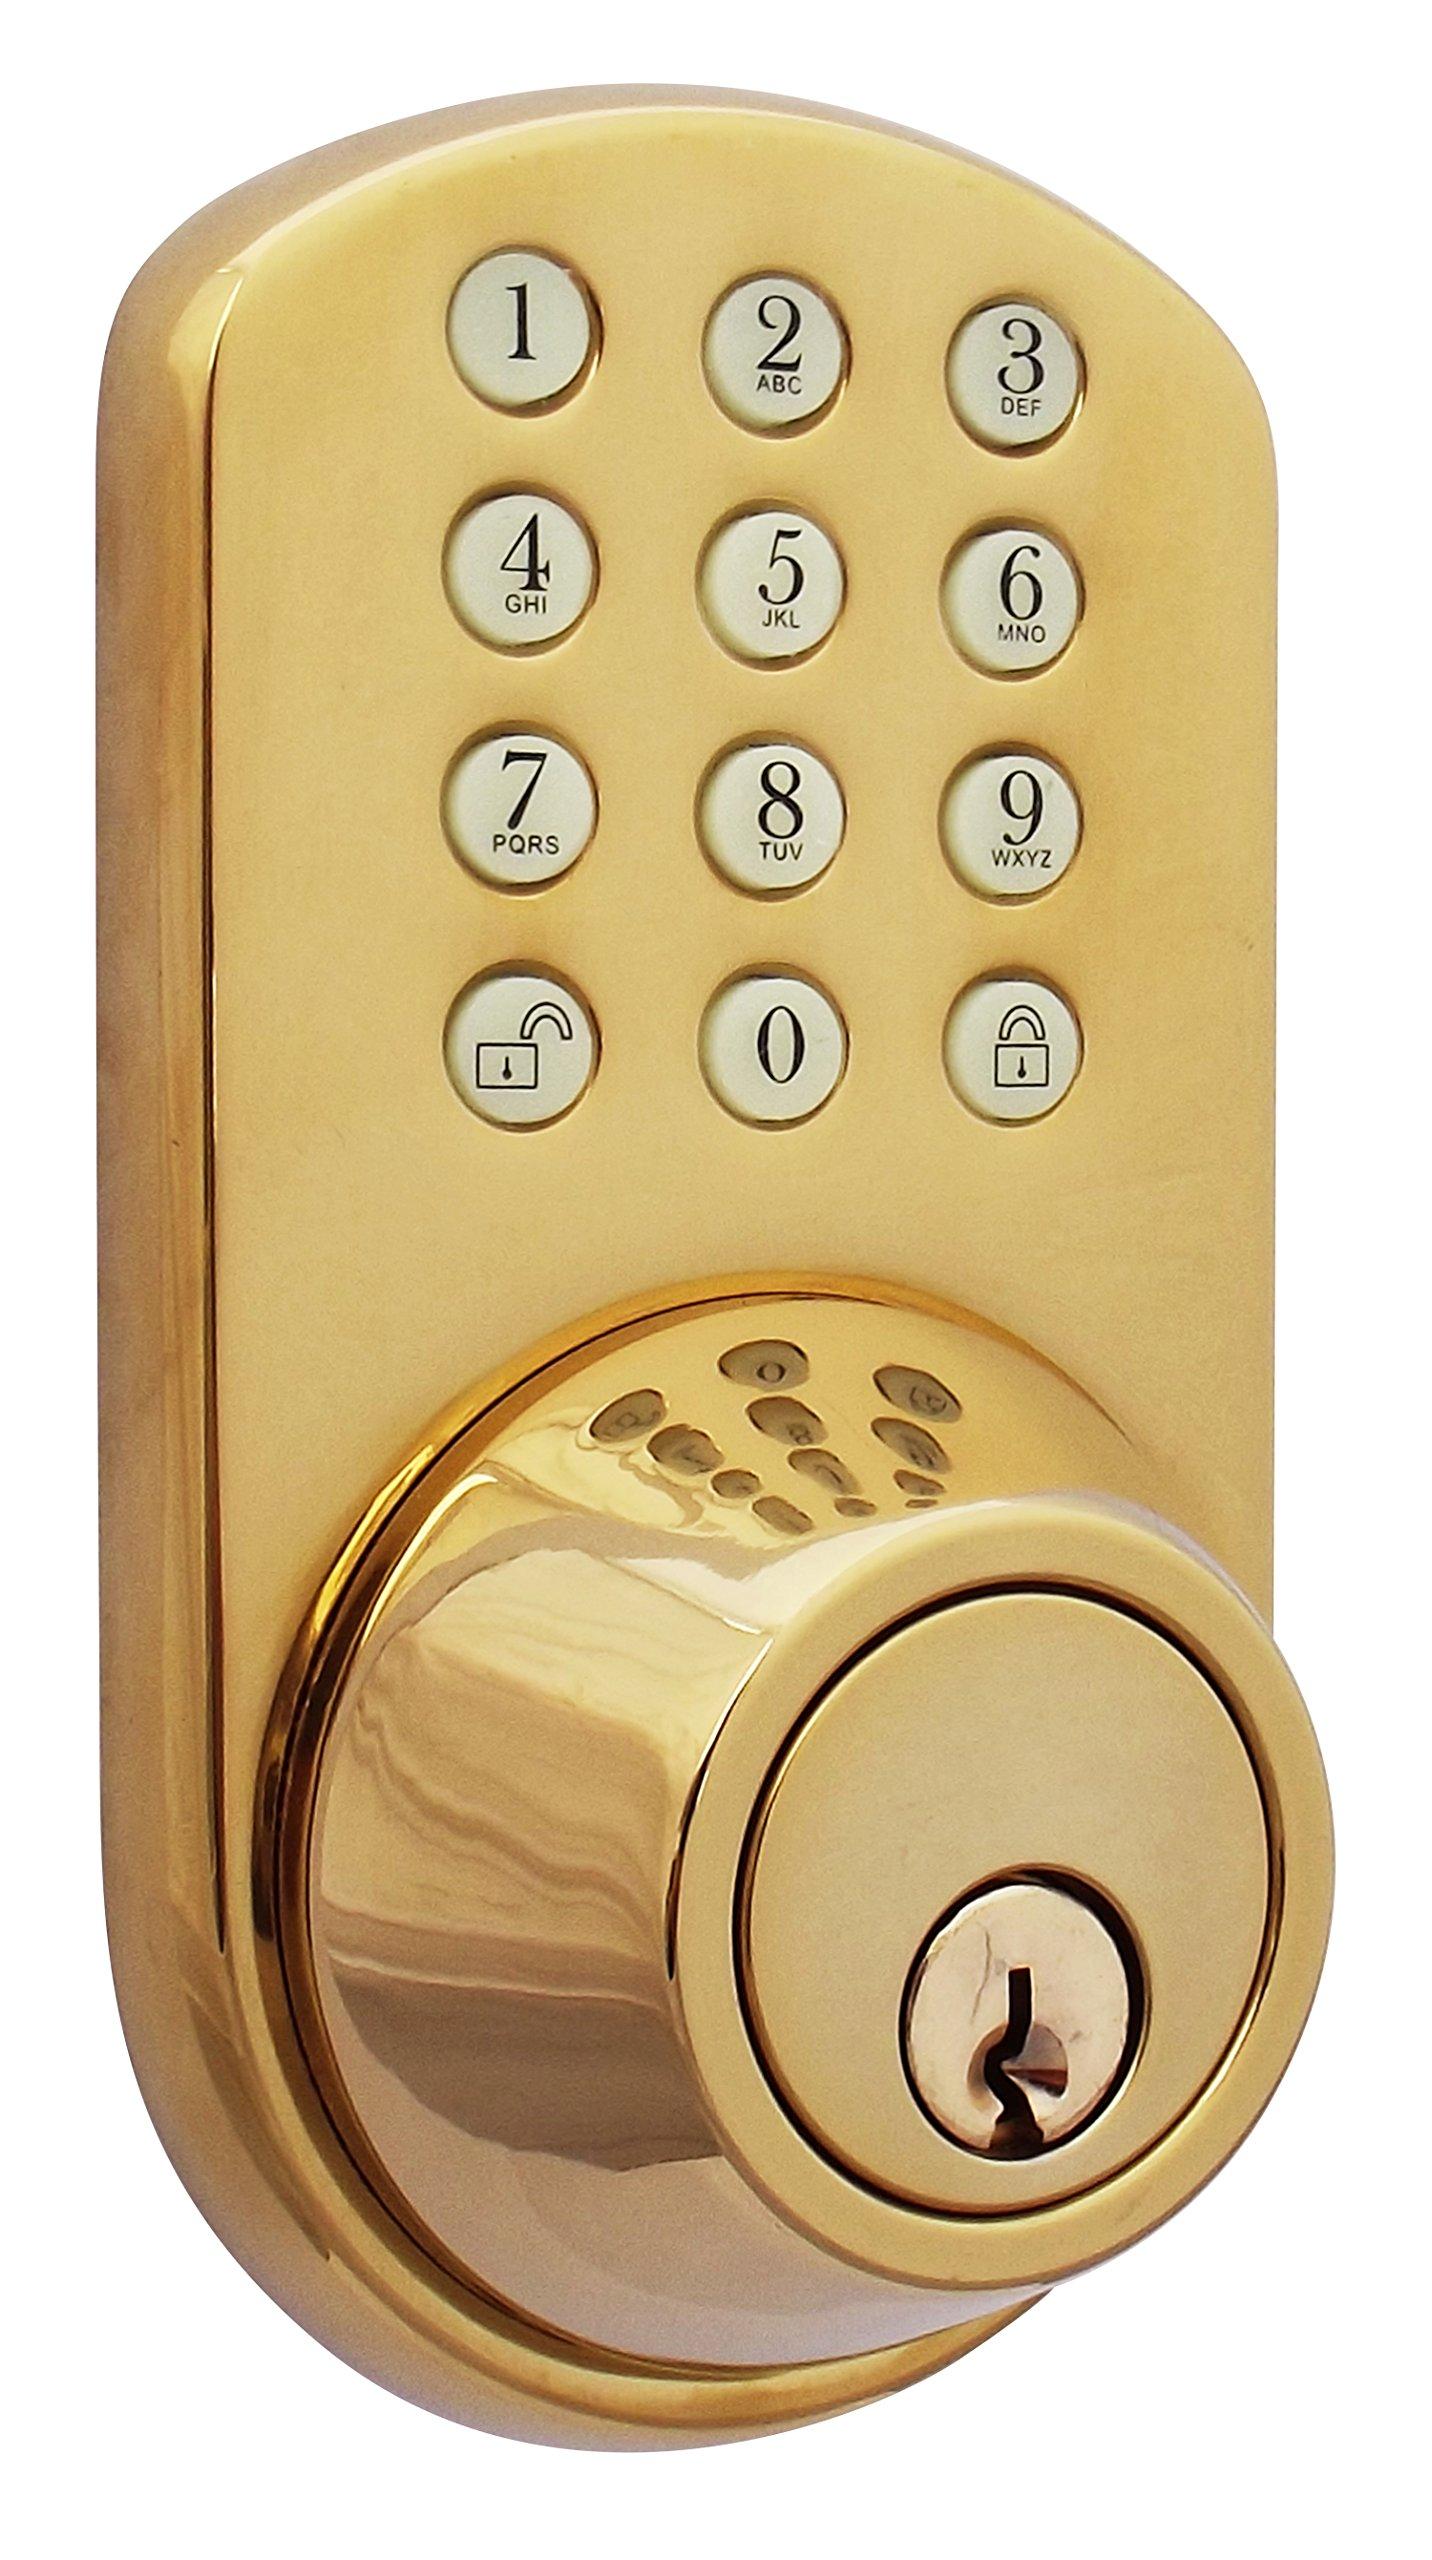 MiLocks TF-02P Digital Deadbolt Door Lock with Electronic Keypad for Exterior Doors, Polished Brass